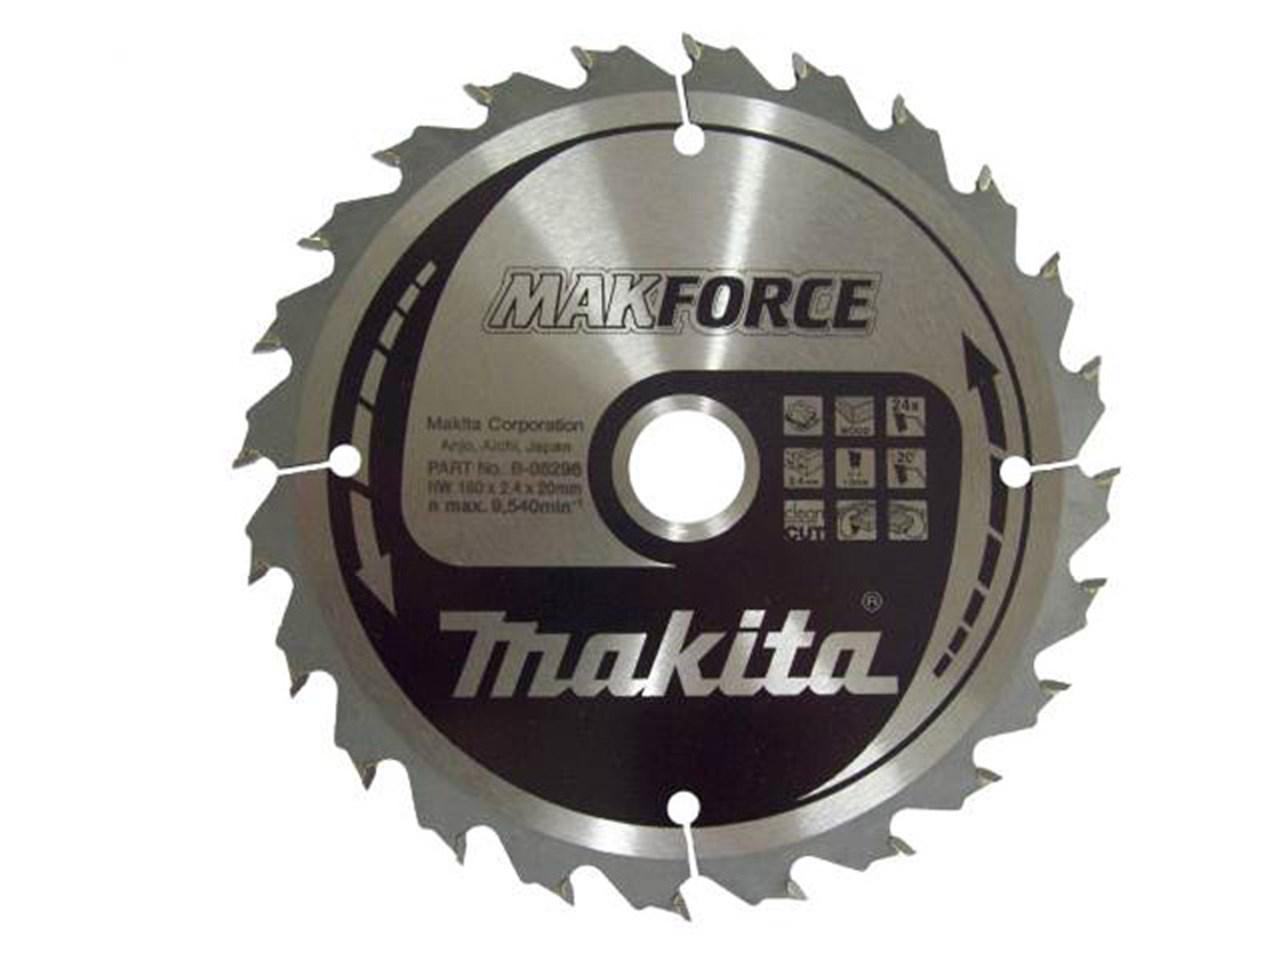 Makita b 08296 160mm x 20mm x 24t circular saw blade makforce greentooth Image collections